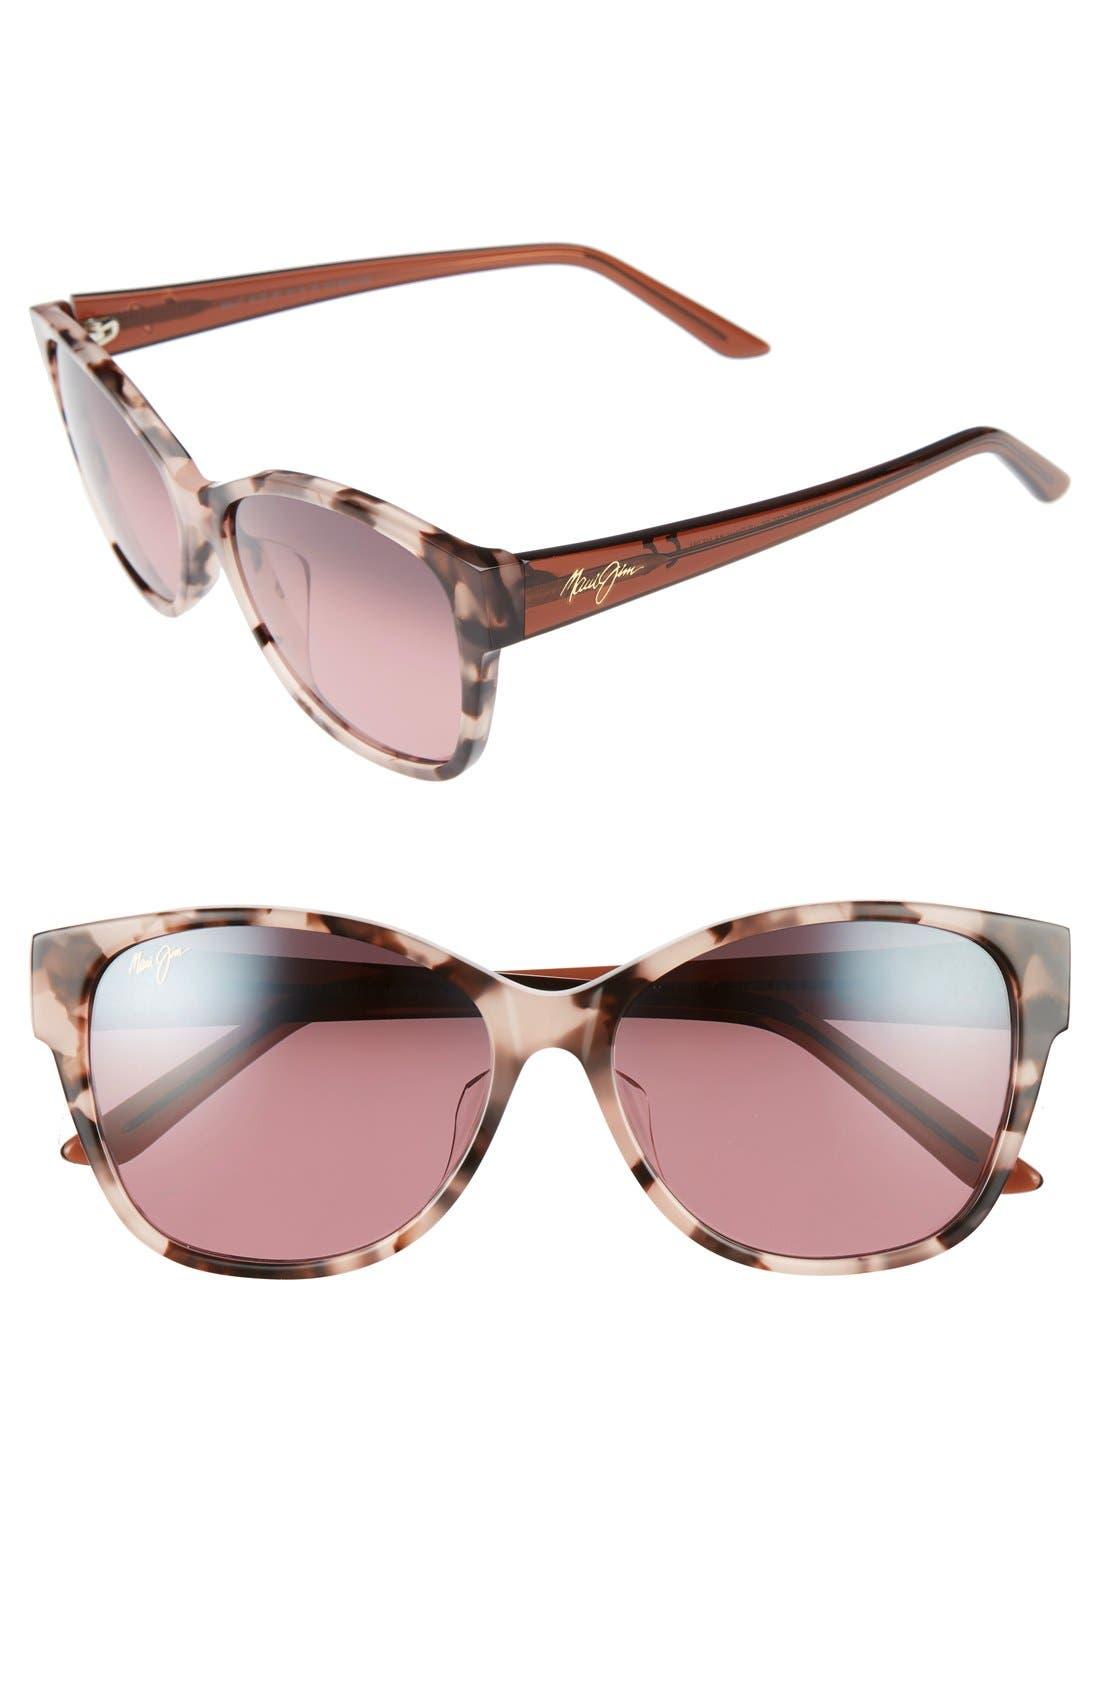 Maui Jim Summer Time 5m Polarizedplus2 Cat Eye Sunglasses - Pink Tokyo Tortoise/ Rose